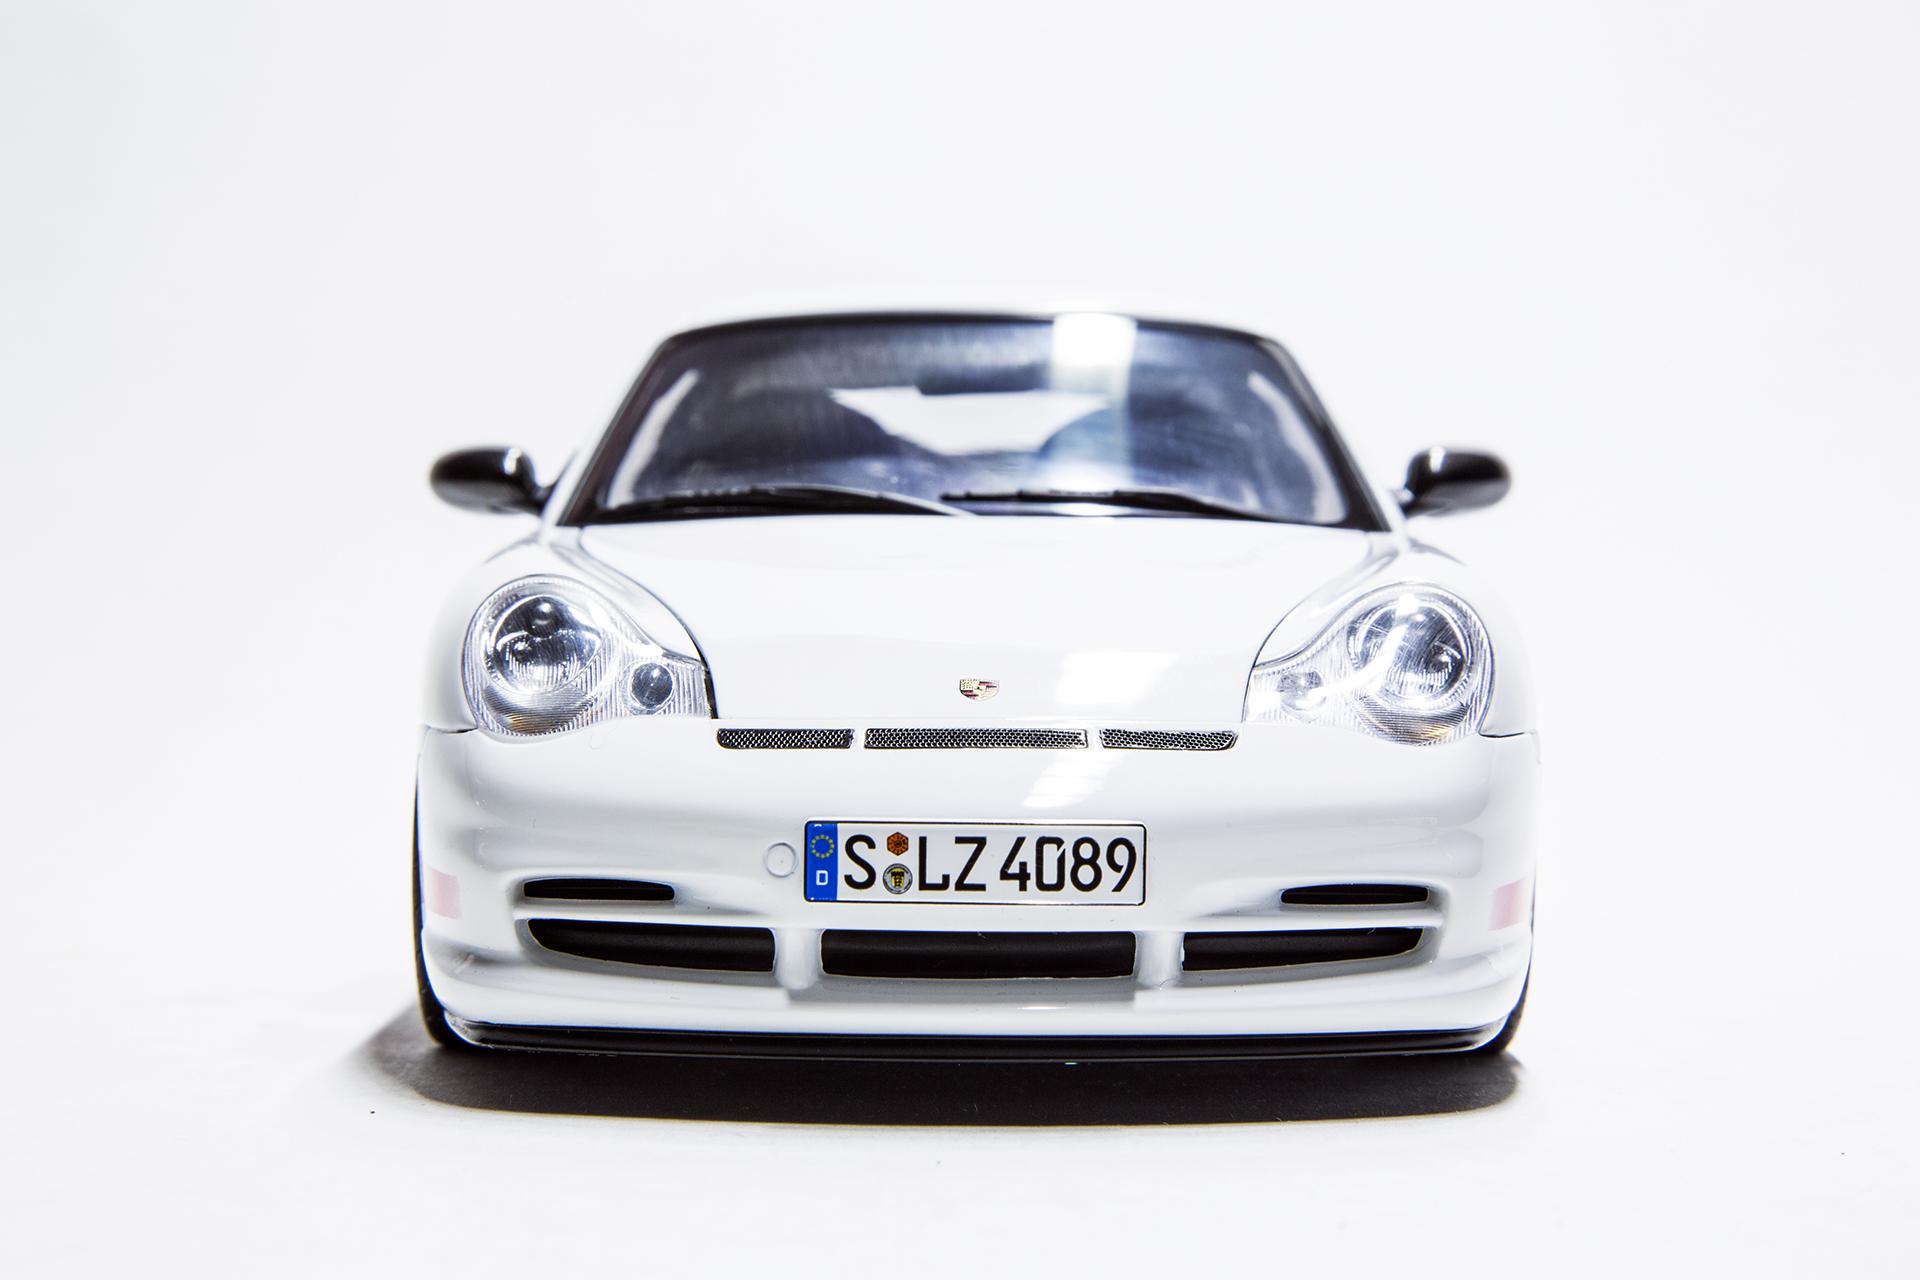 18diecast com   1:18 Scale Diecast Model Cars » Porsche 911 GT3 RS